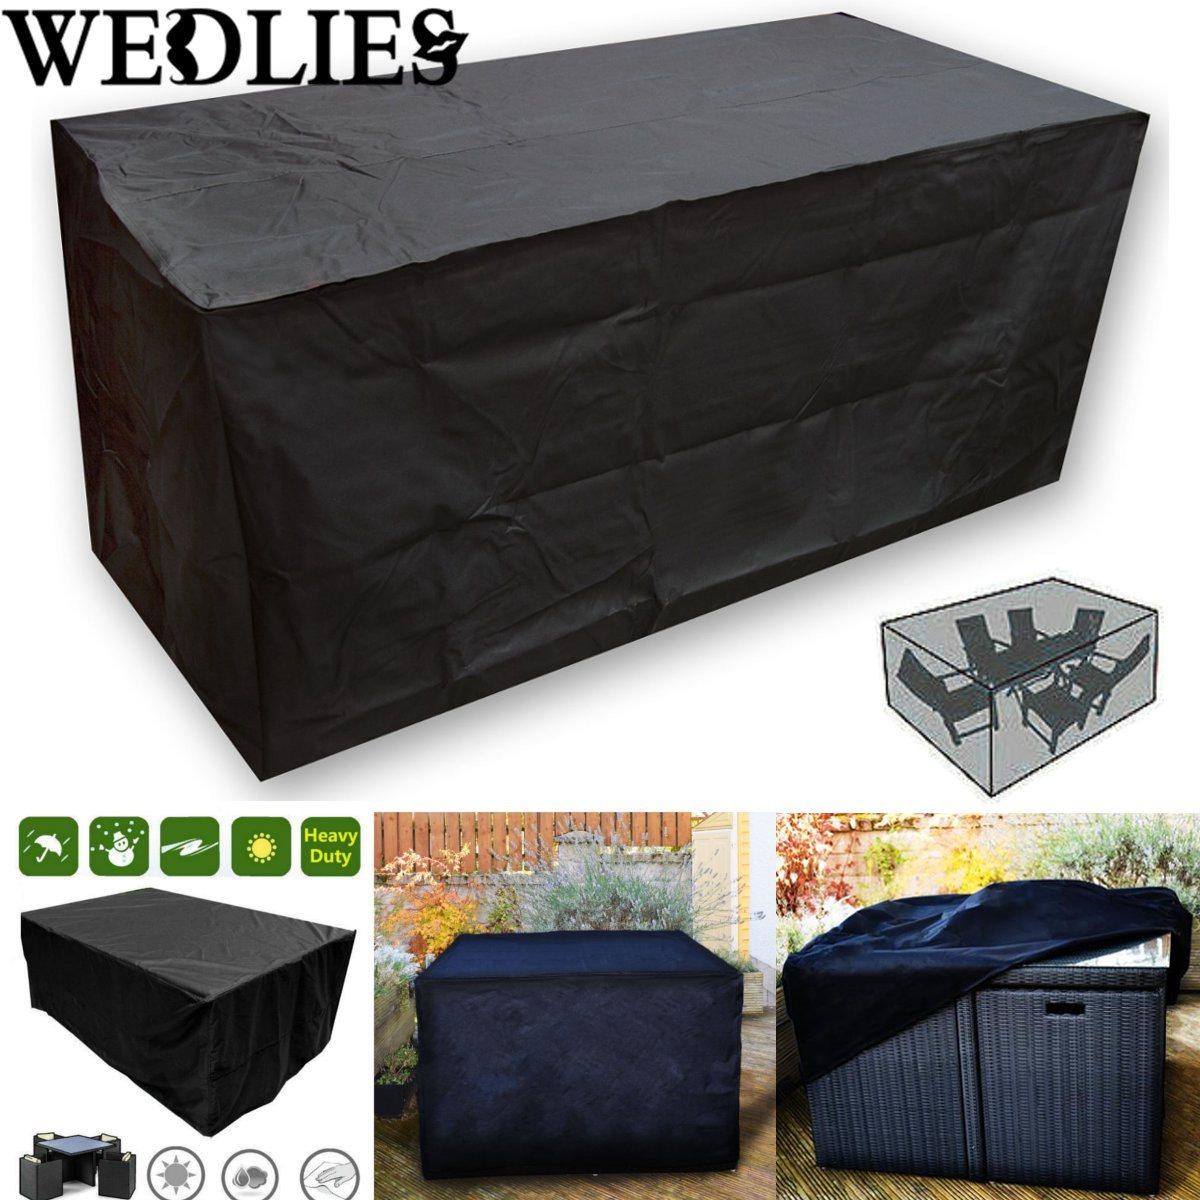 Waterproof Outdoor Patio Furniture Set Cover 205x104x71cm